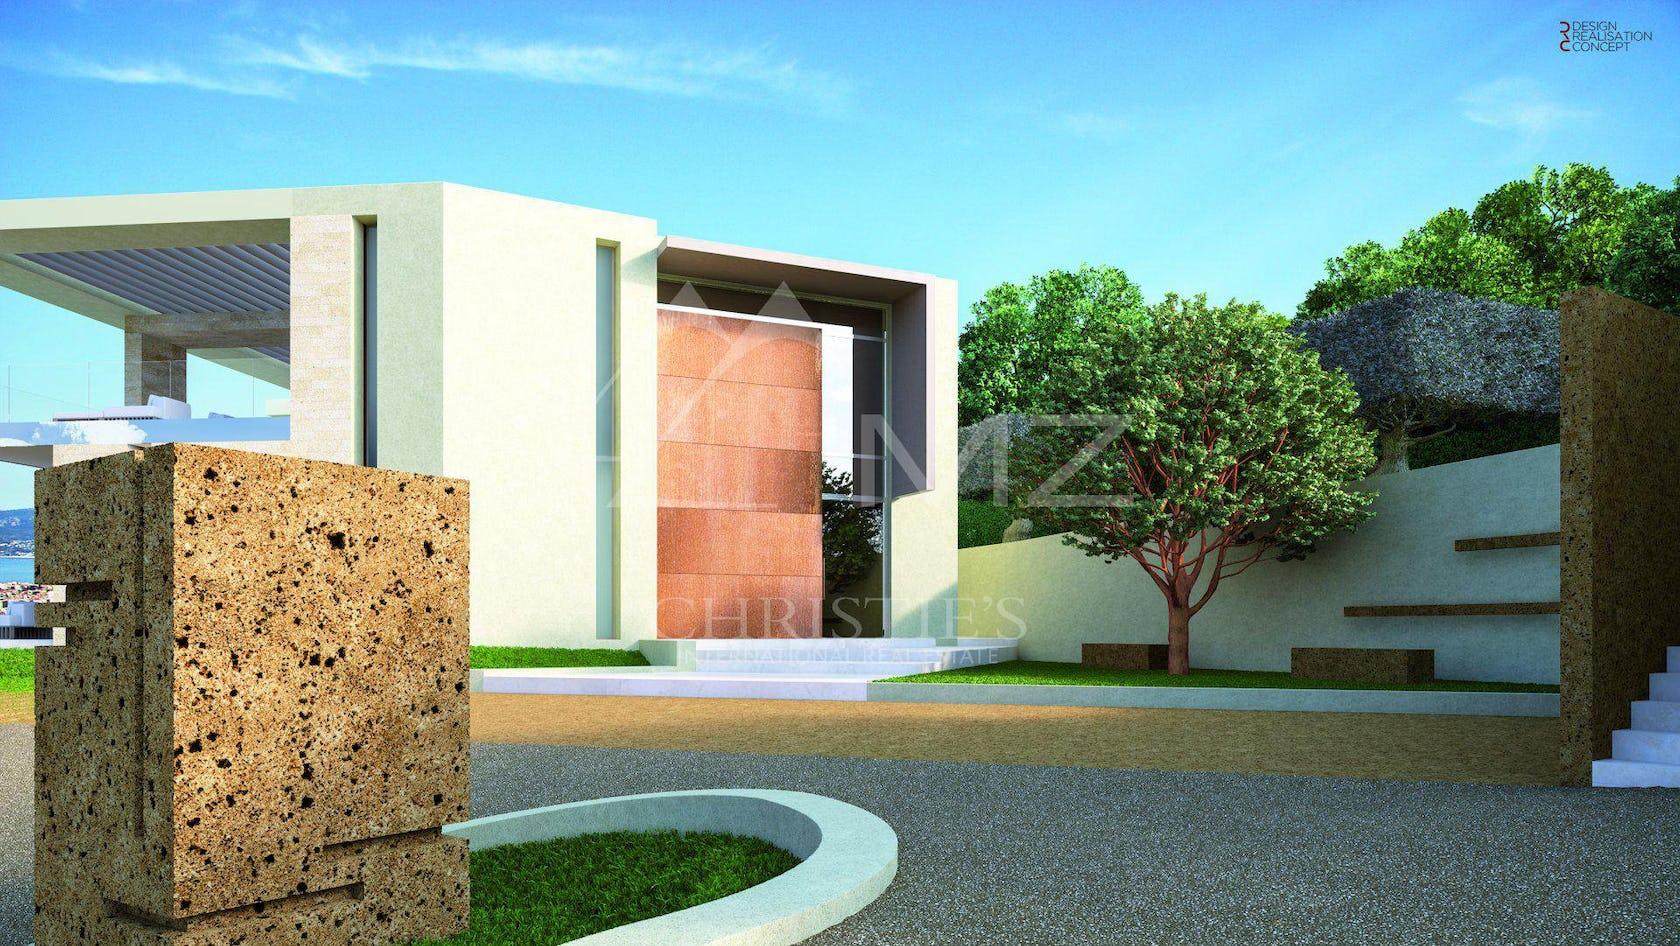 tarmac asphalt grass plant building